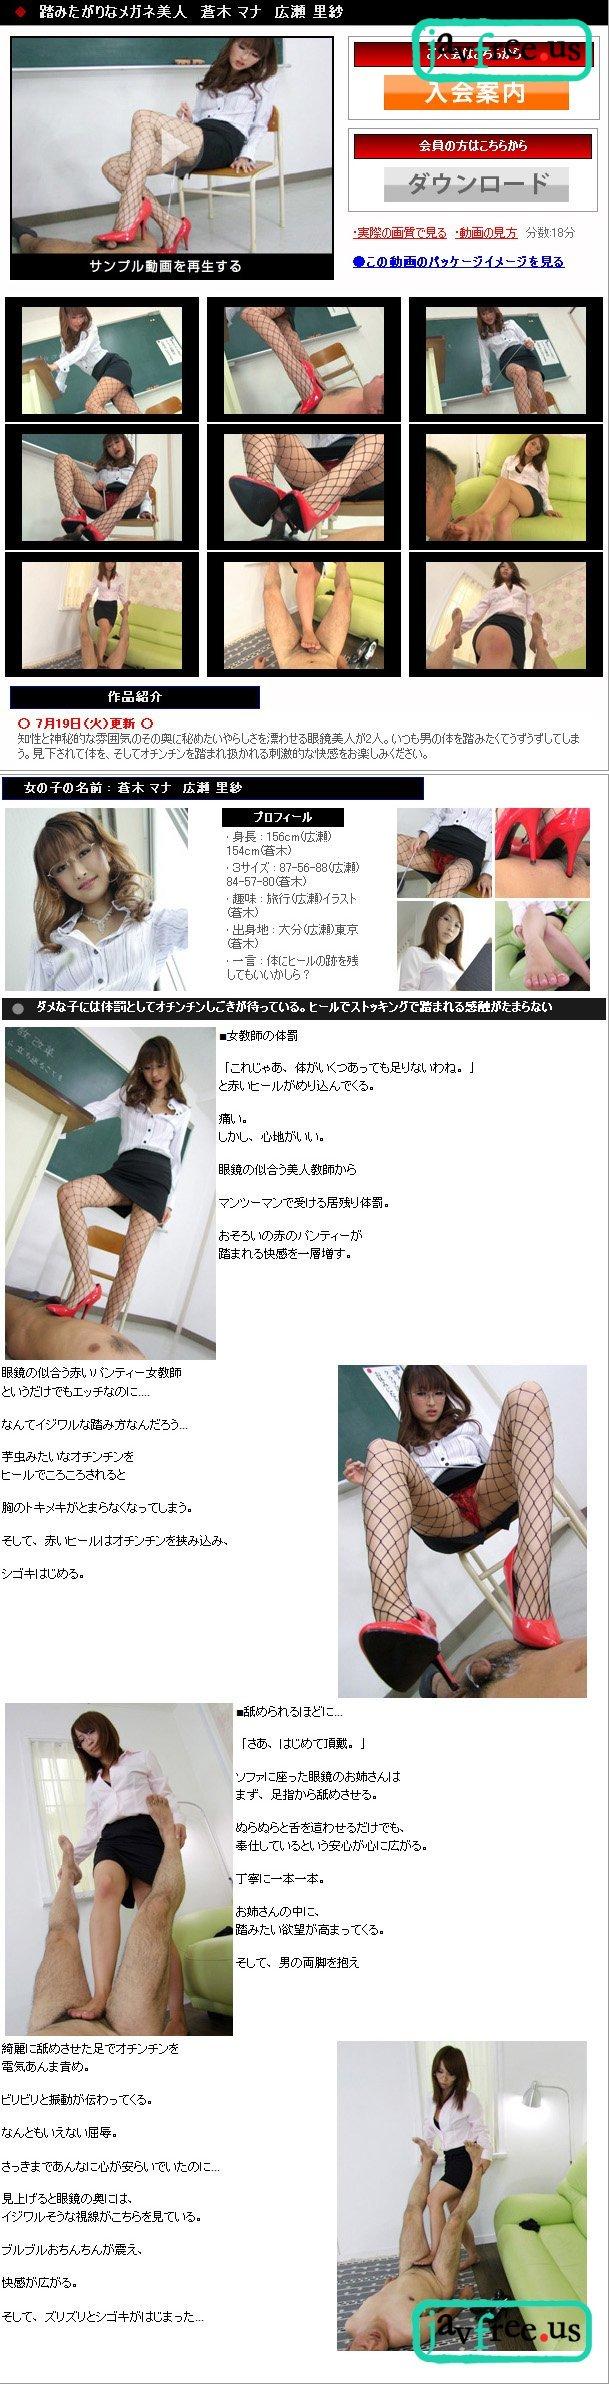 Roselip 0468 踏みたがりなメガネ美人 蒼木 マナ 広瀬里紗 - image Roselip0468b on https://javfree.me